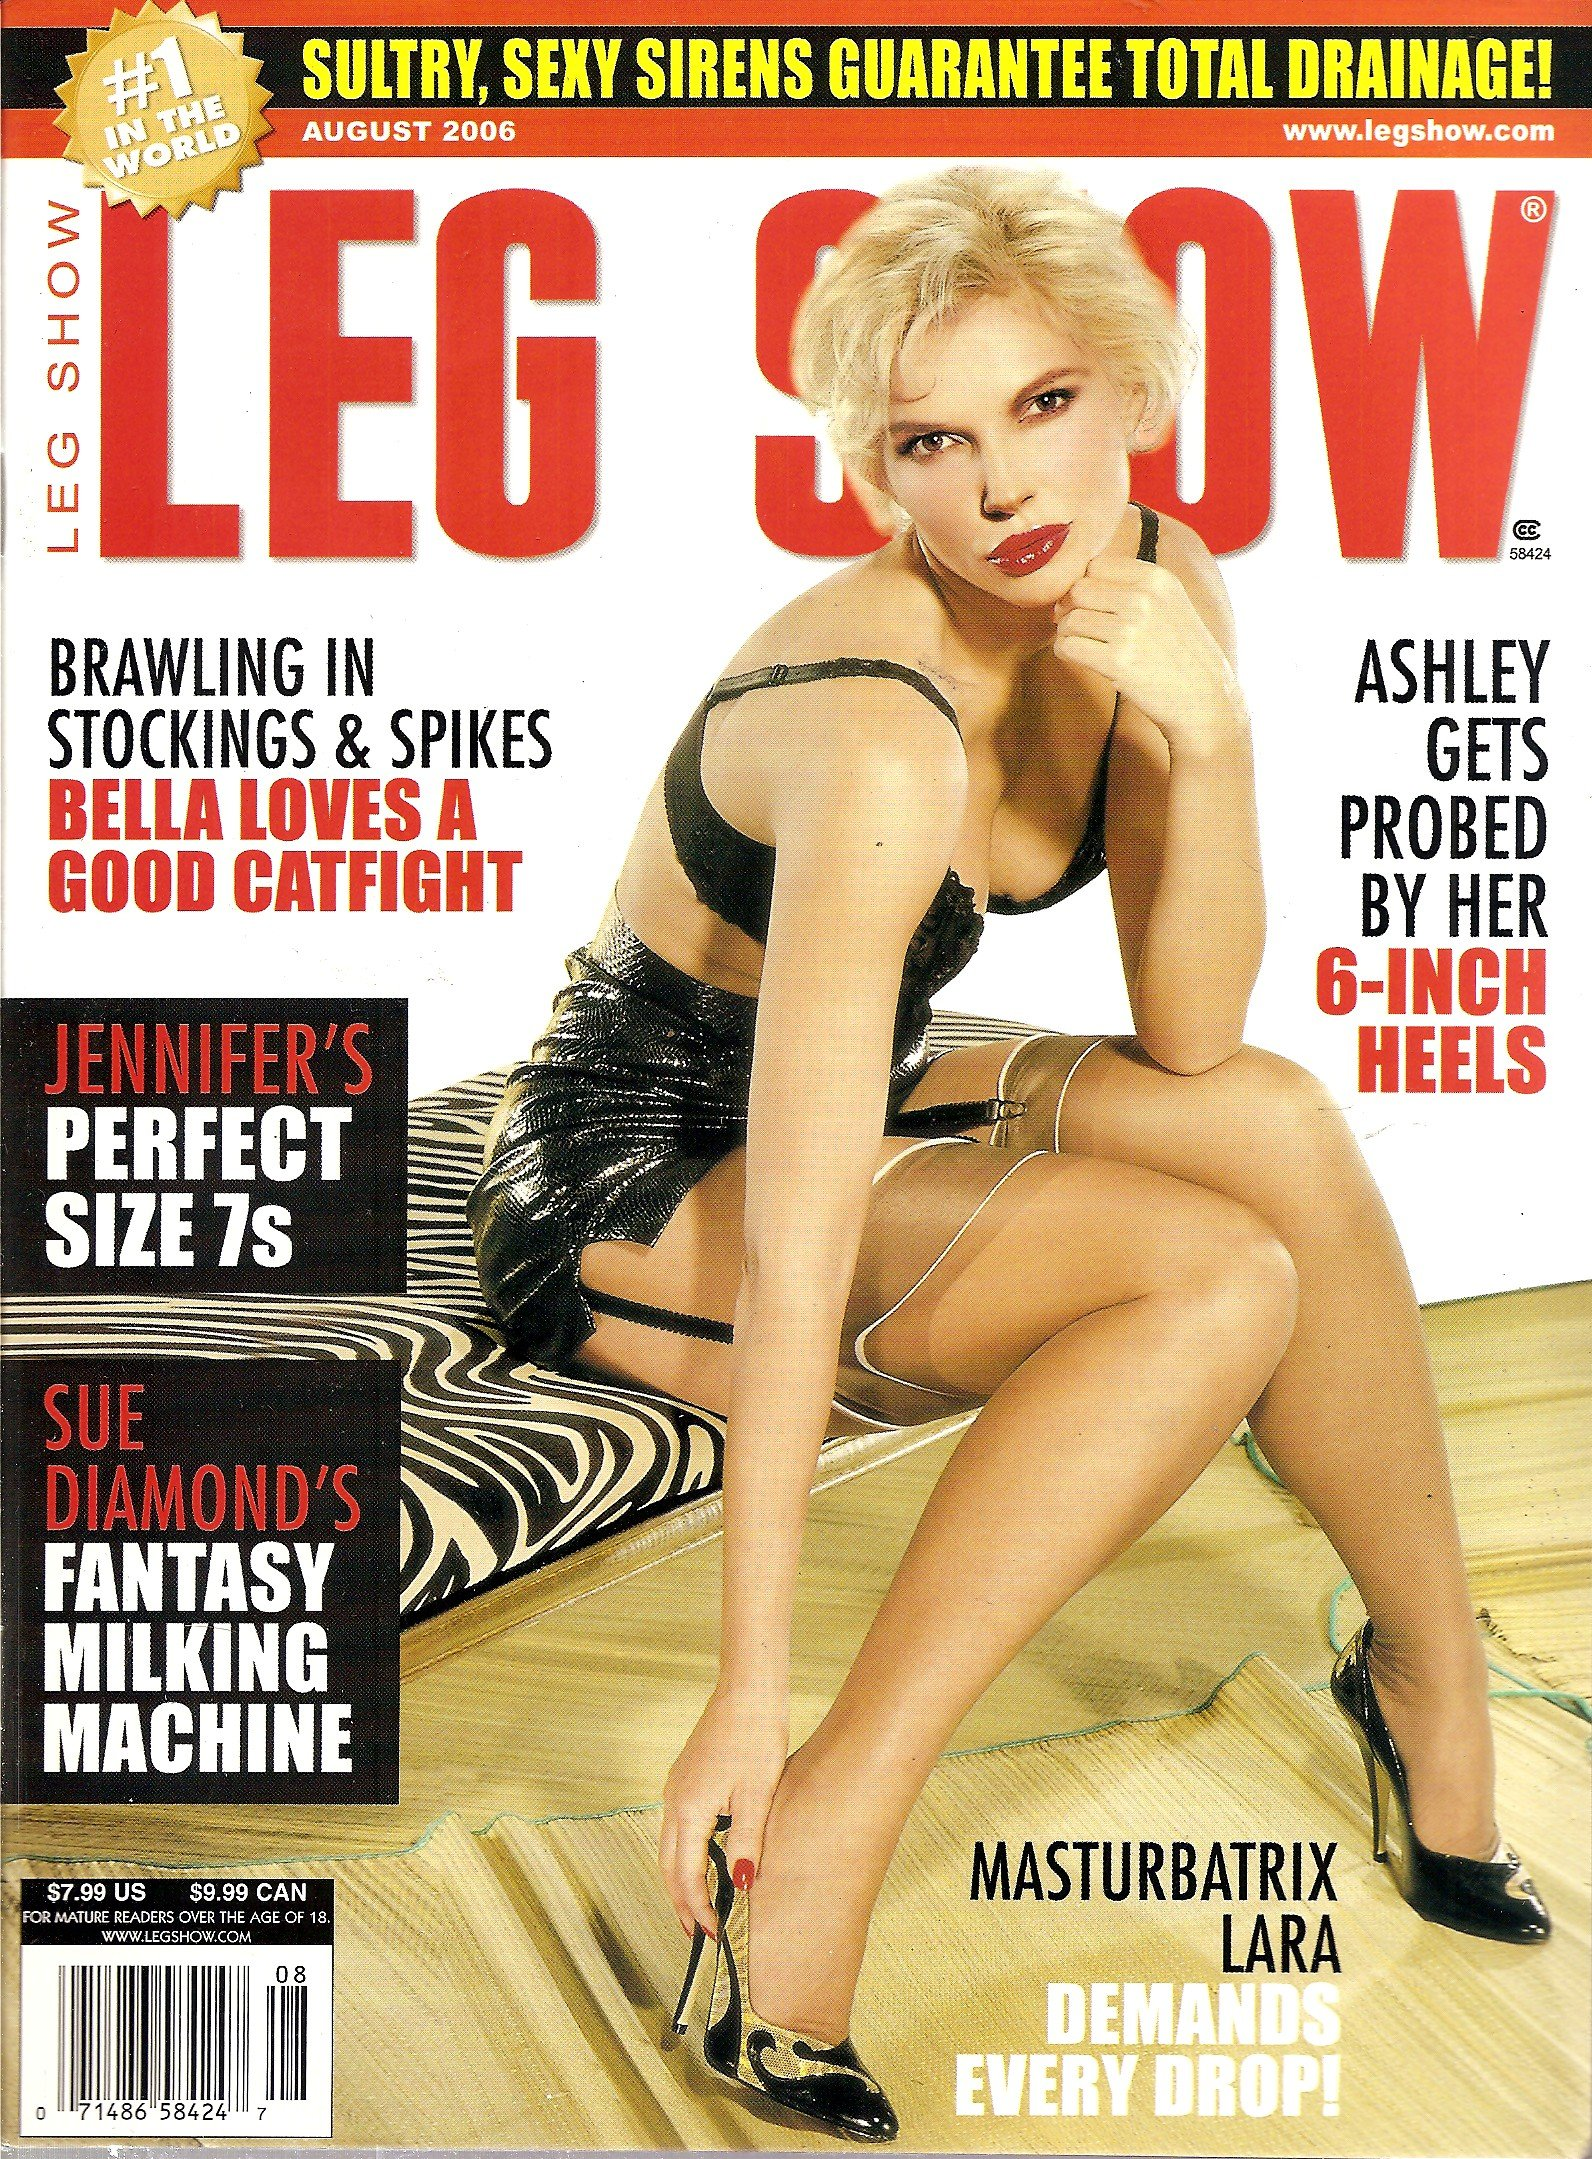 Legshow sam.leonardjoel.com.au